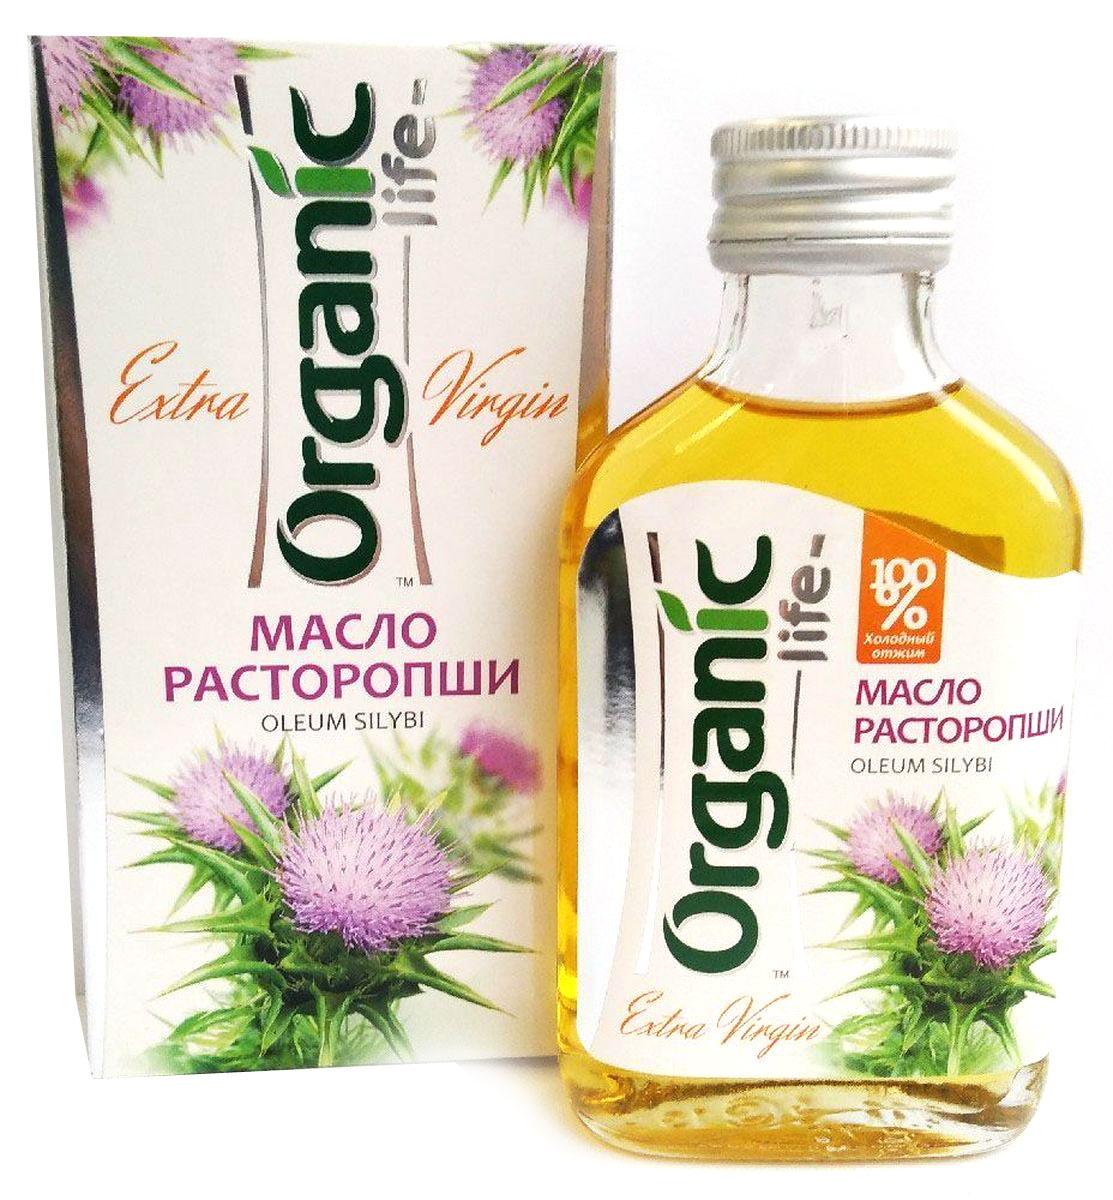 Organic Life масло расторопши, 100 мл масло расторопши пятнистой куплю продам